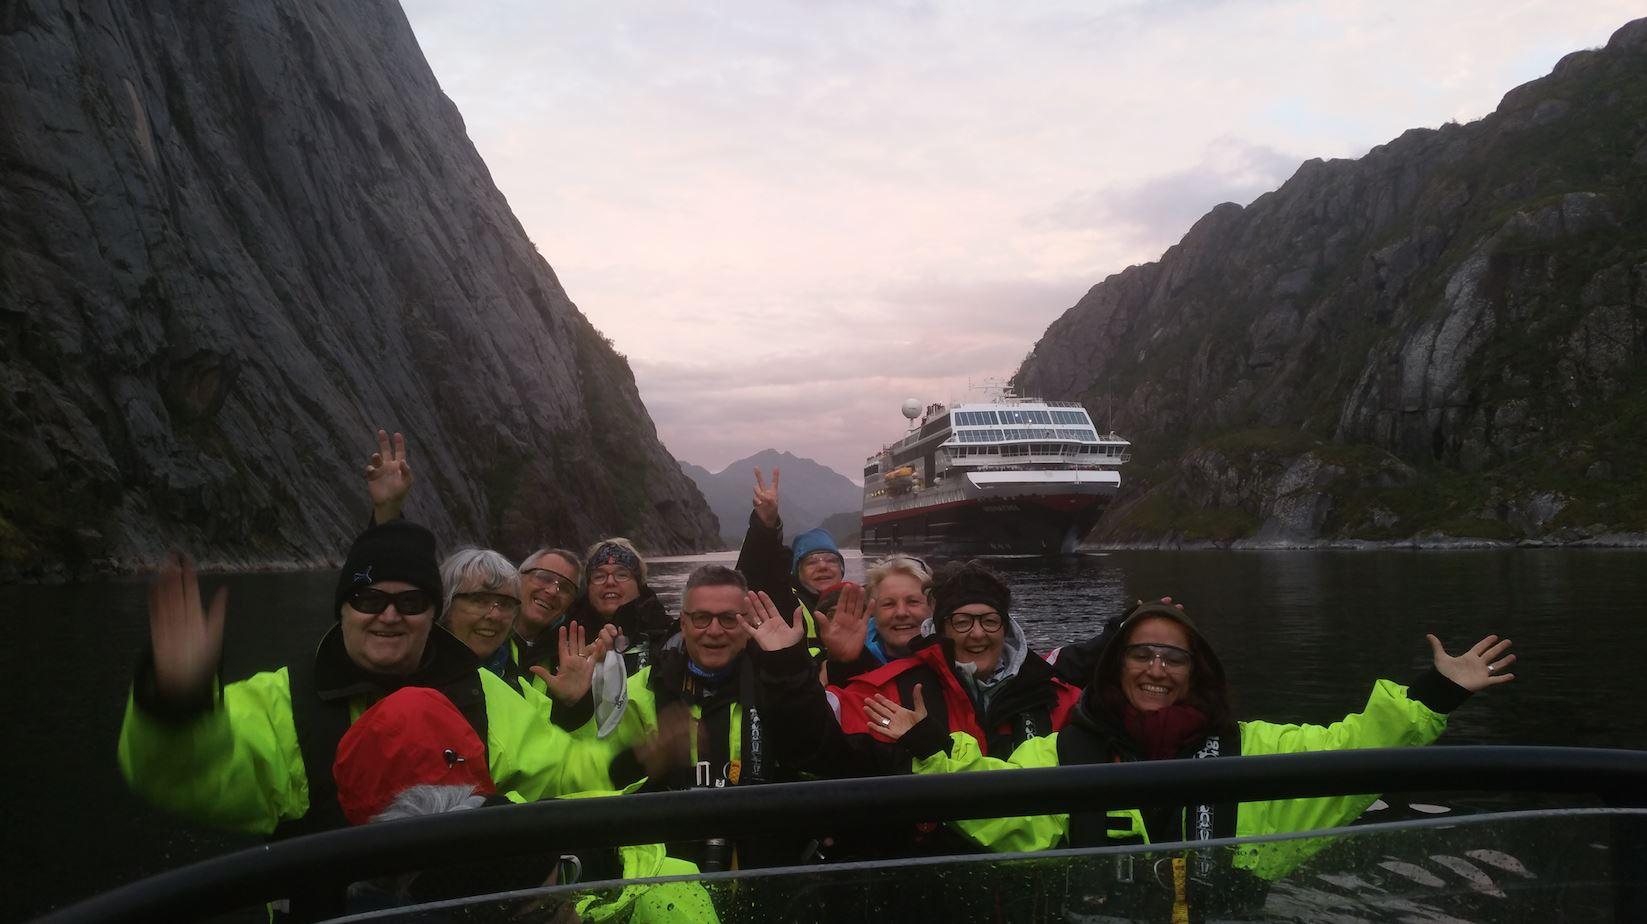 © Go2Lofoten, Sea Eagle Safari from Svolvaer to Trollfjord with RIB - Go2Lofoten